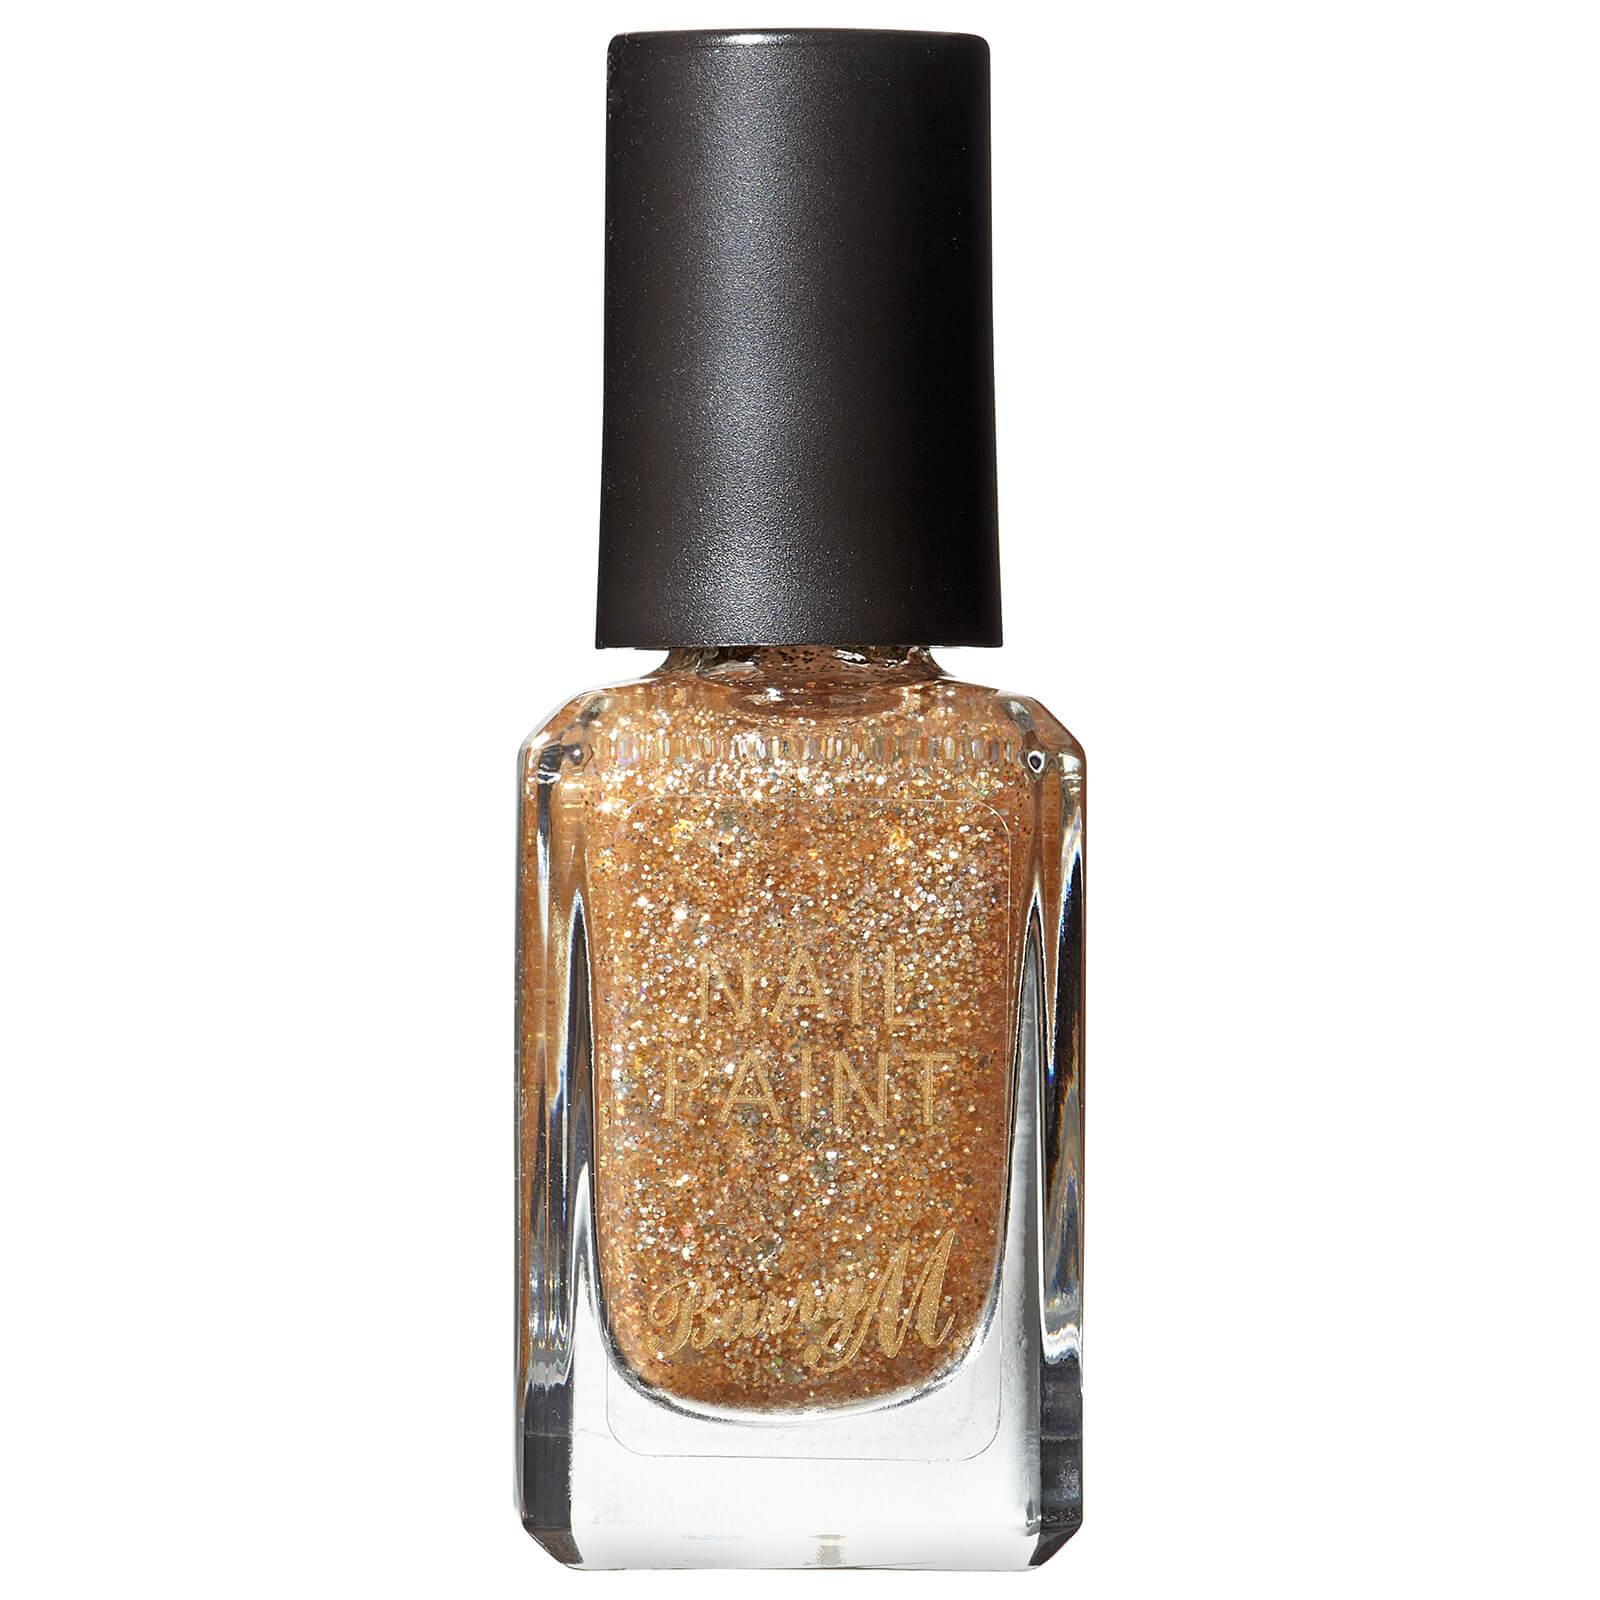 Купить Barry M Cosmetics Classic Nail Paint (Various Shades) - Majestic Sparkle